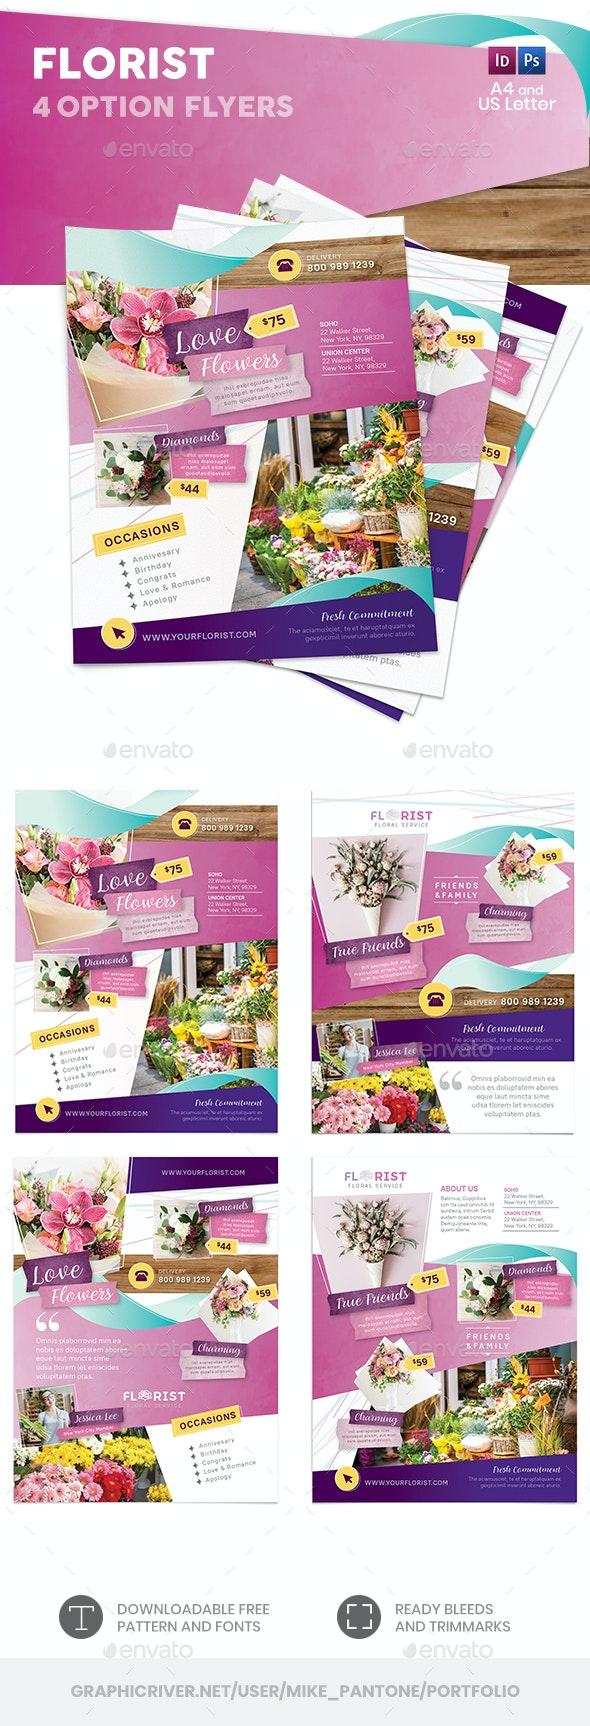 Florist Flyers 4 – 4 Options - Commerce Flyers